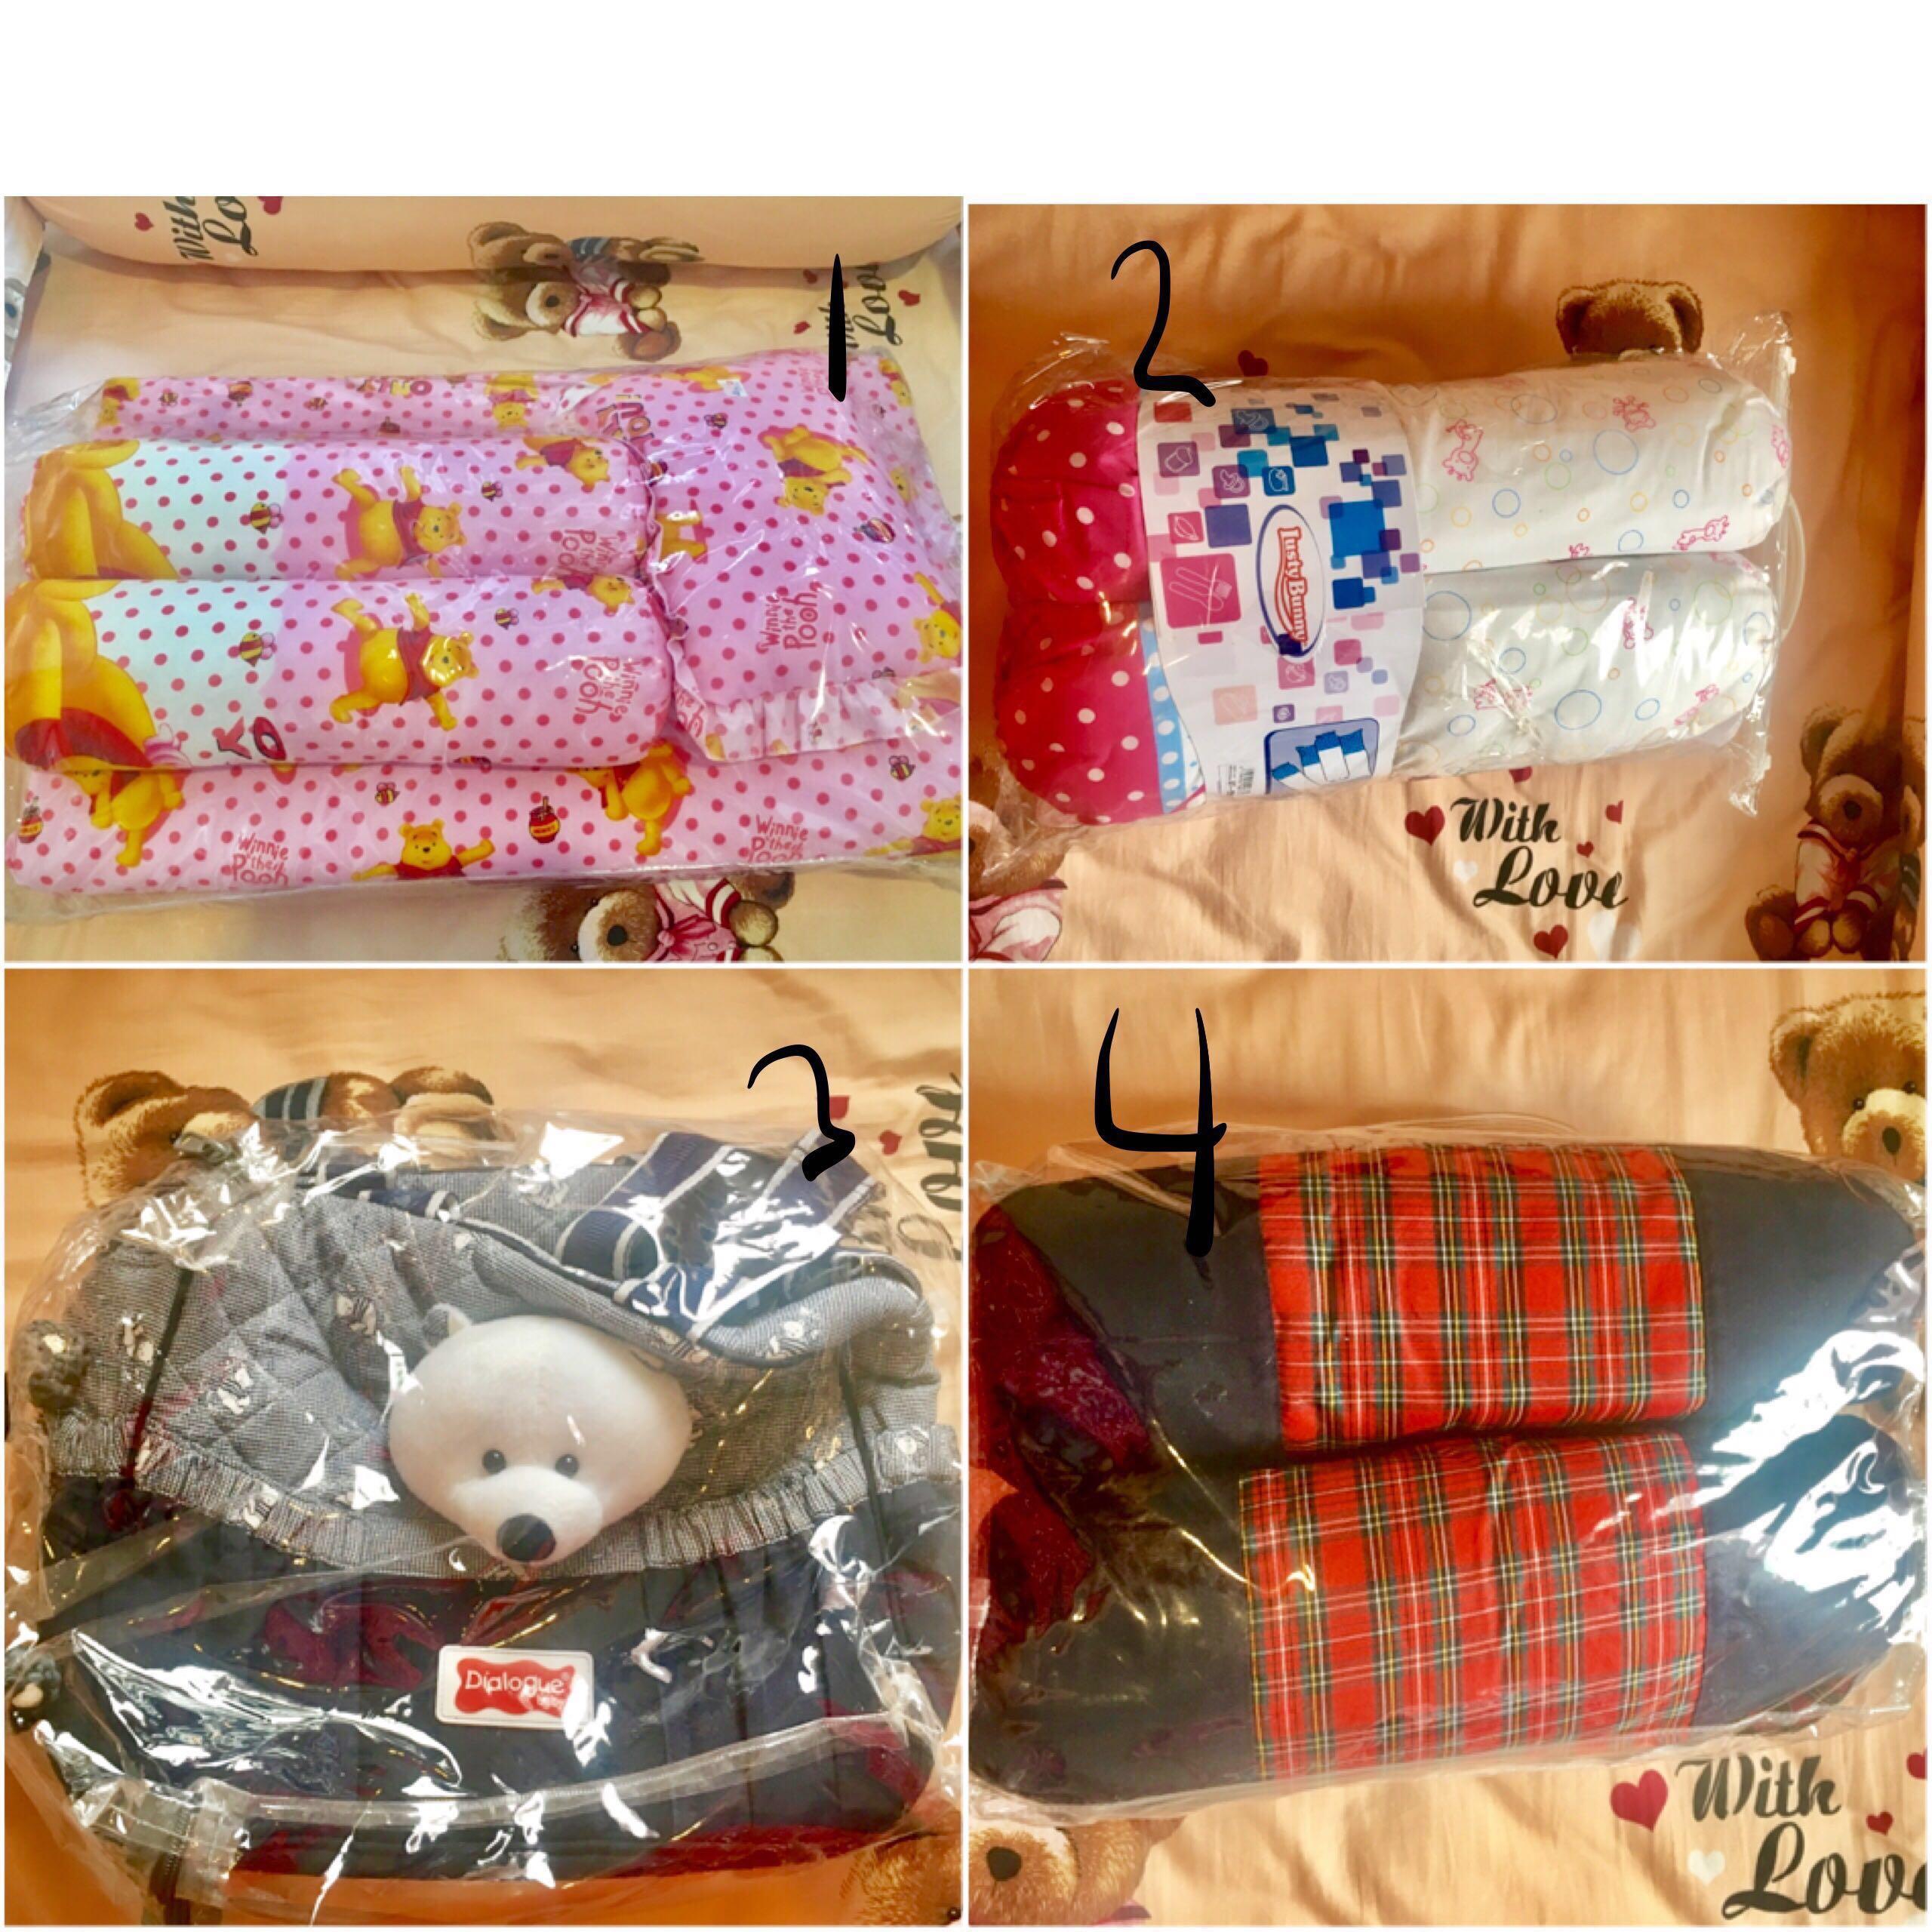 Obral pillow set bantal guling tas gendongan bayi snobby dialoque lusty bunny